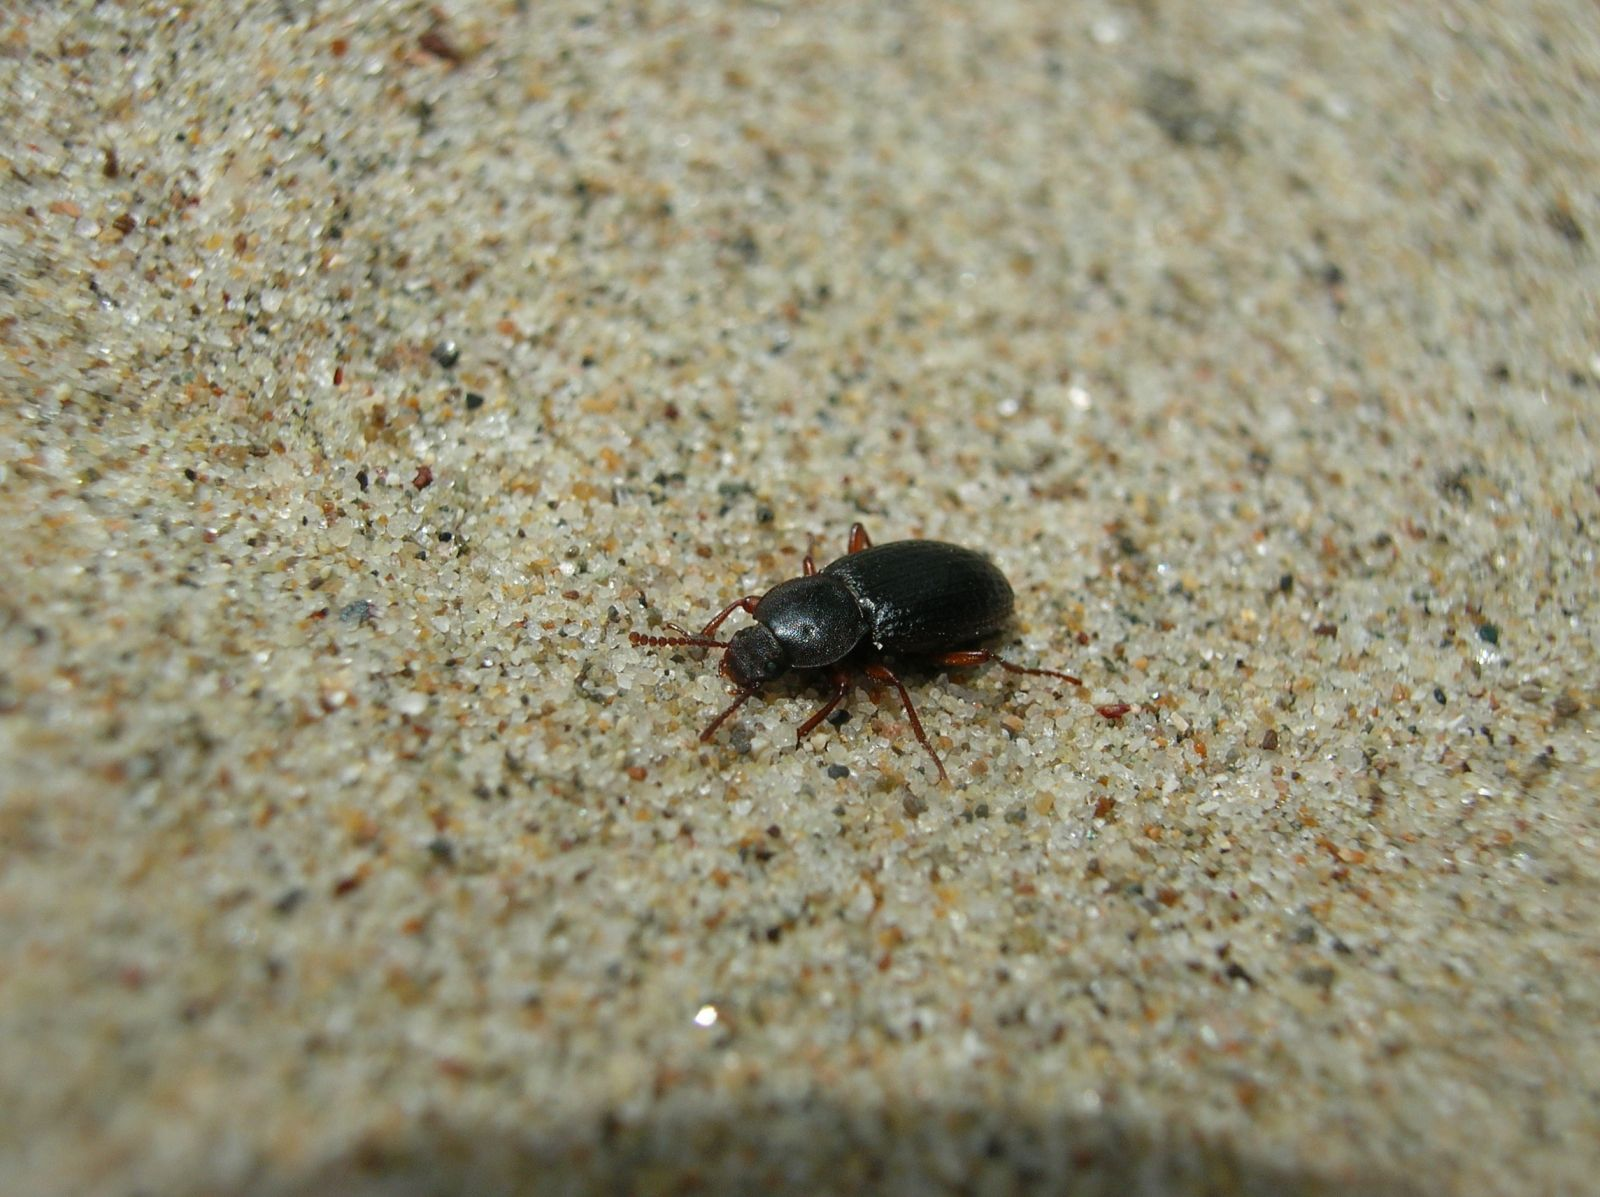 Beetles. Credit: Dave Hubbard